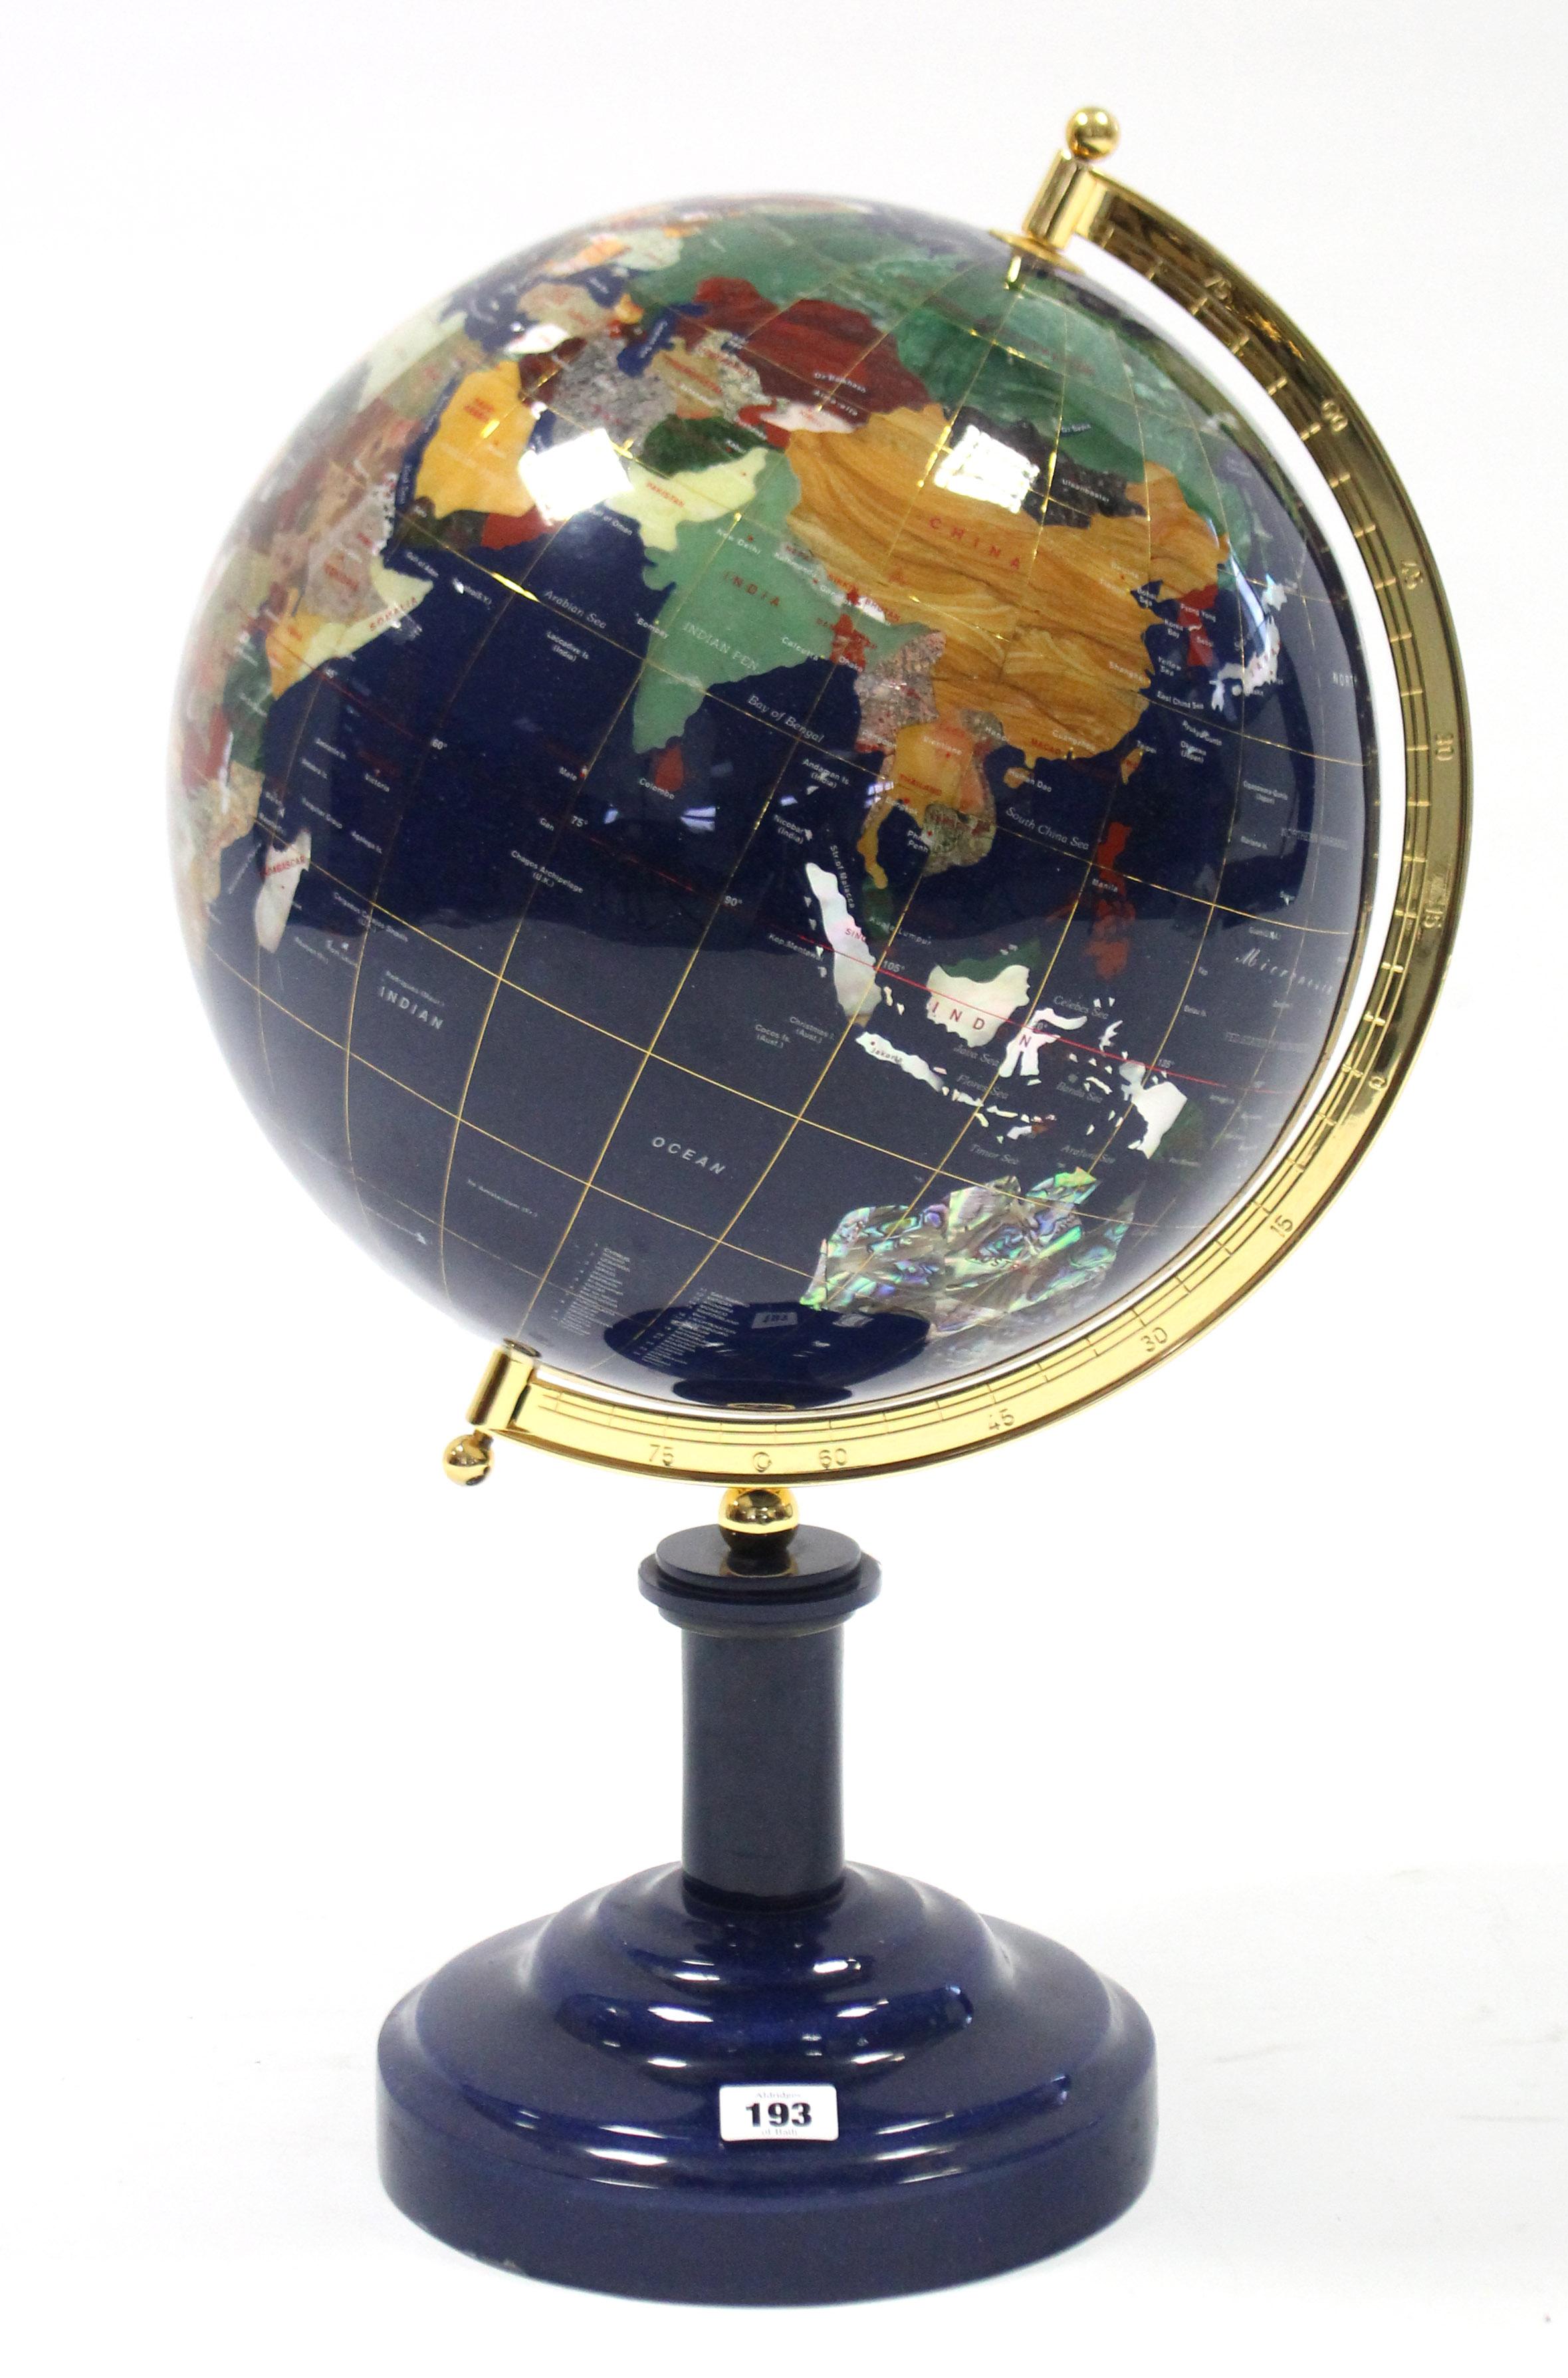 Lot 193 - A modern semi-precious coloured hardstone terrestrial globe on blue-finish stepped circular plinth